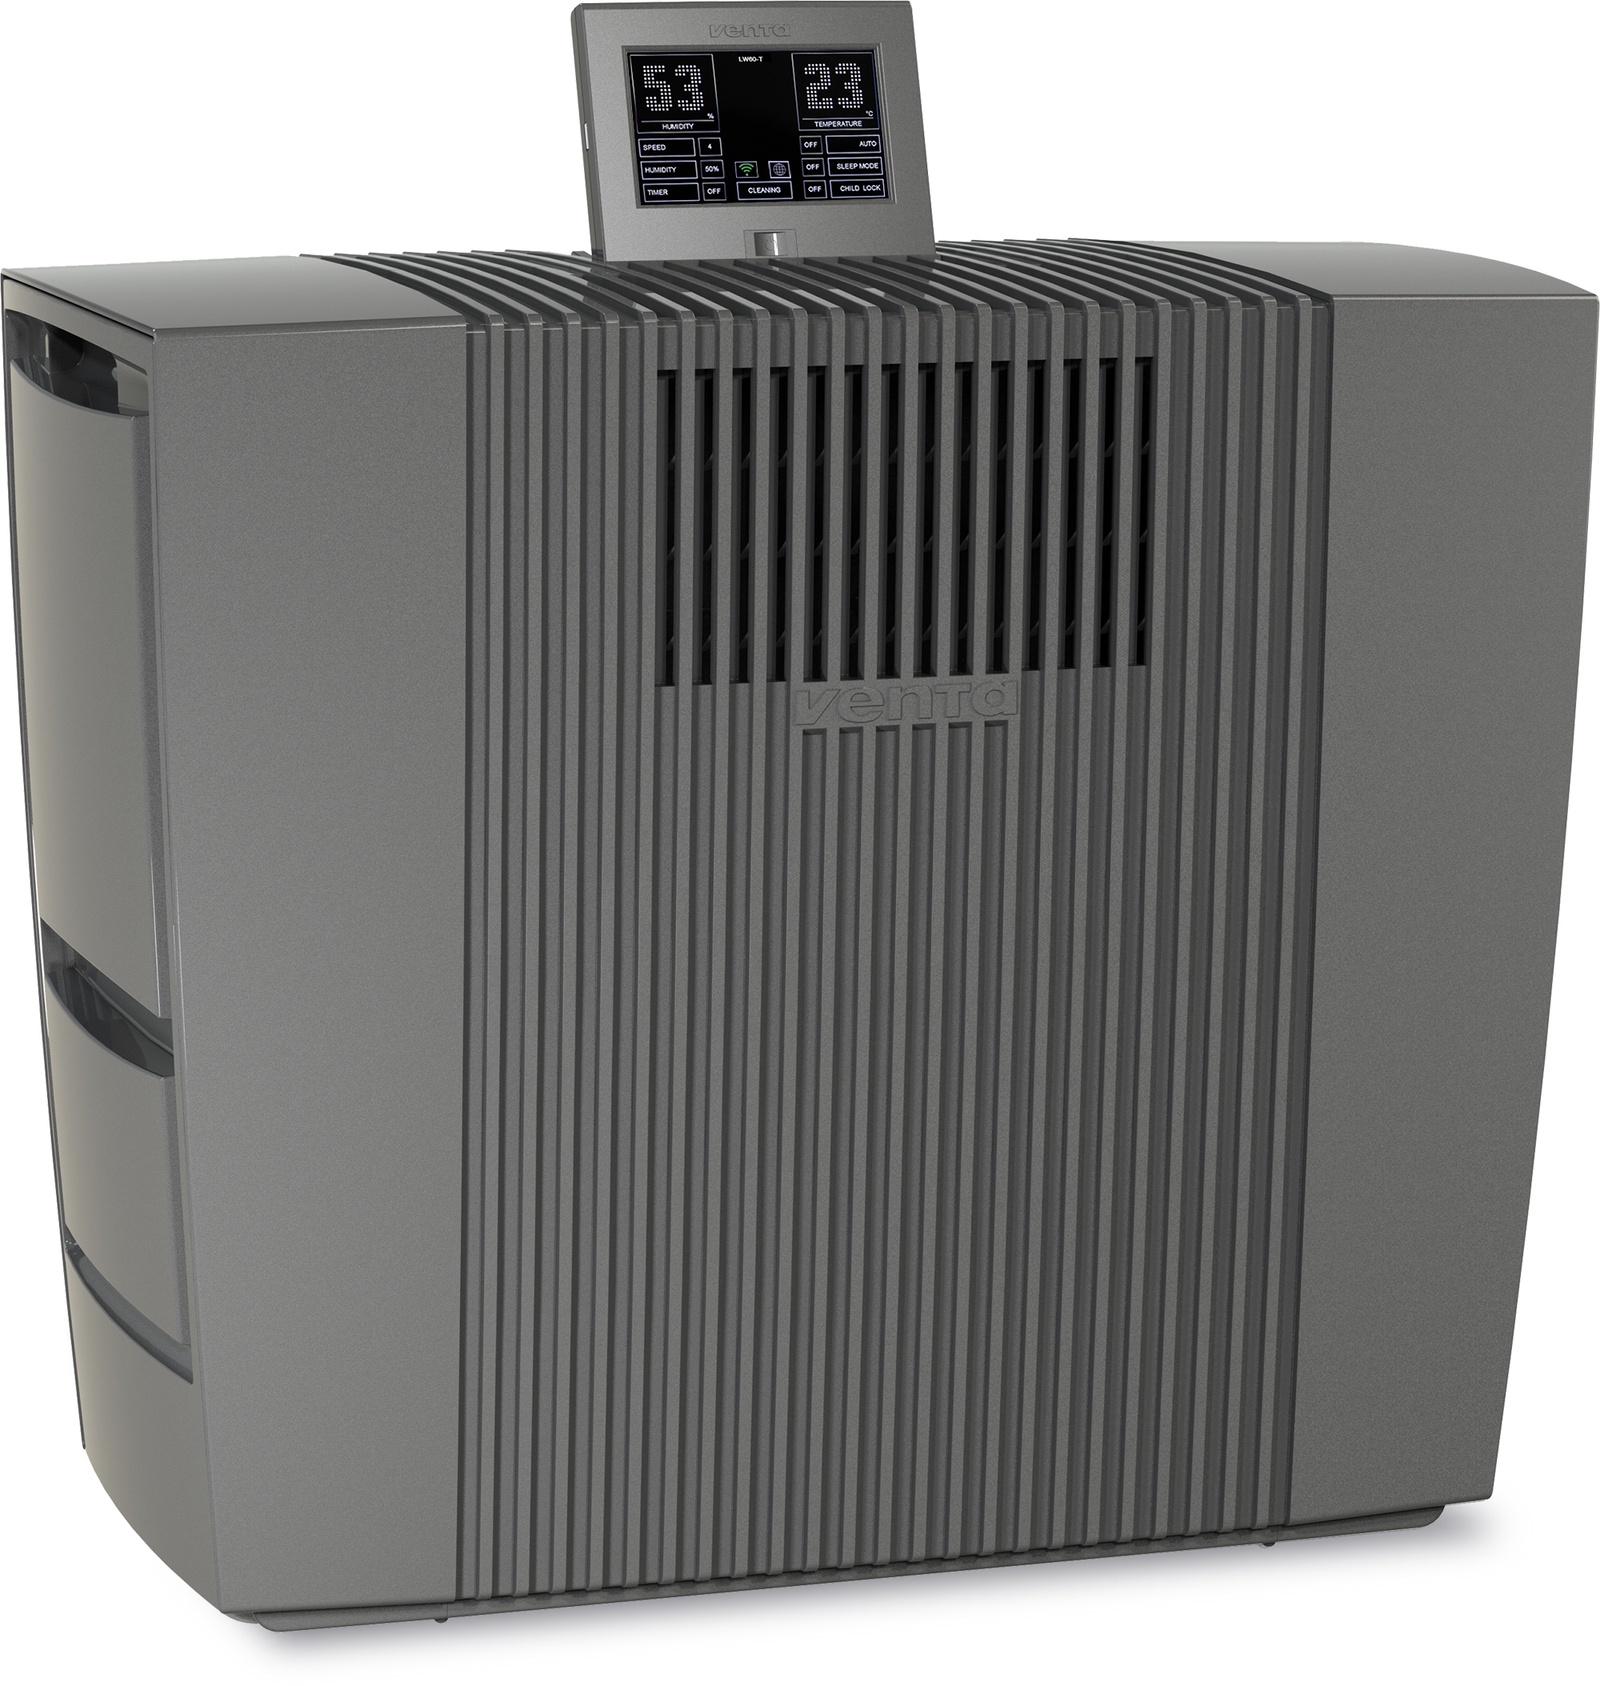 Мойка воздуха Venta Venta black/white, LW60 T WiFi anth цена